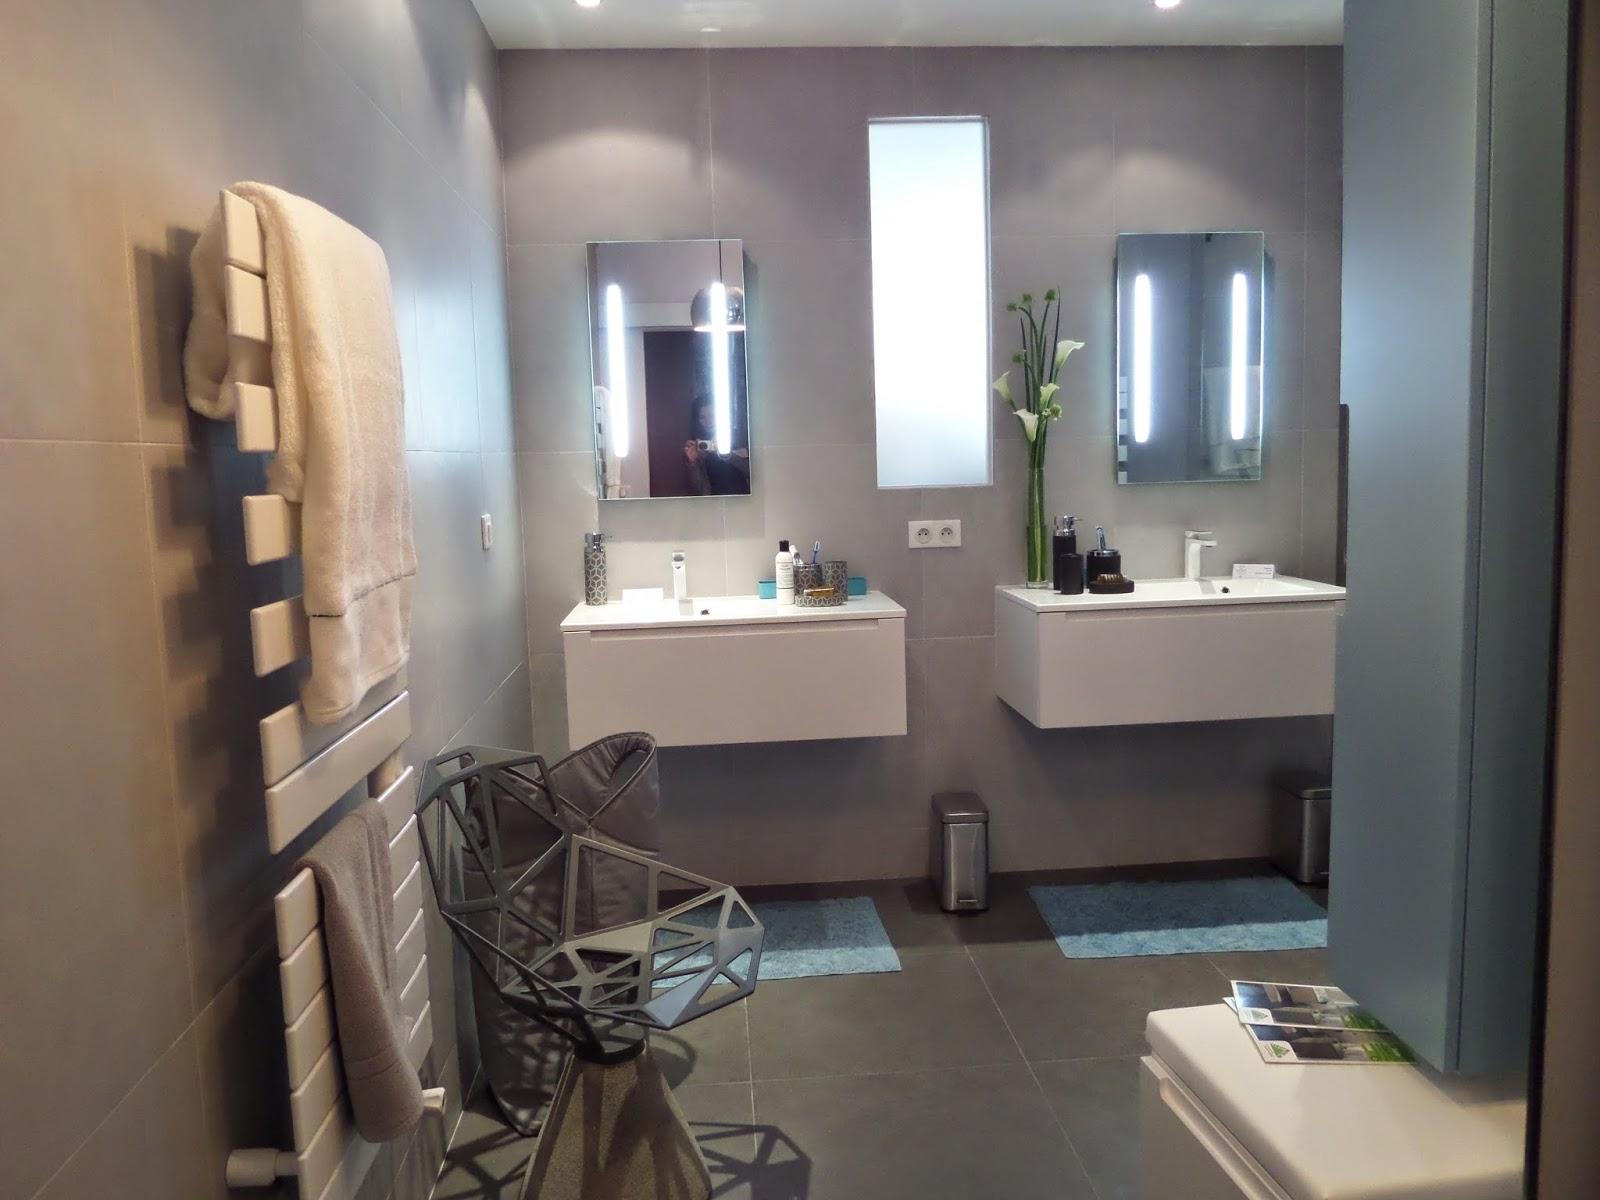 Meuble salle de bain gris galet - Leroy merlin lavabo salle de bain ...